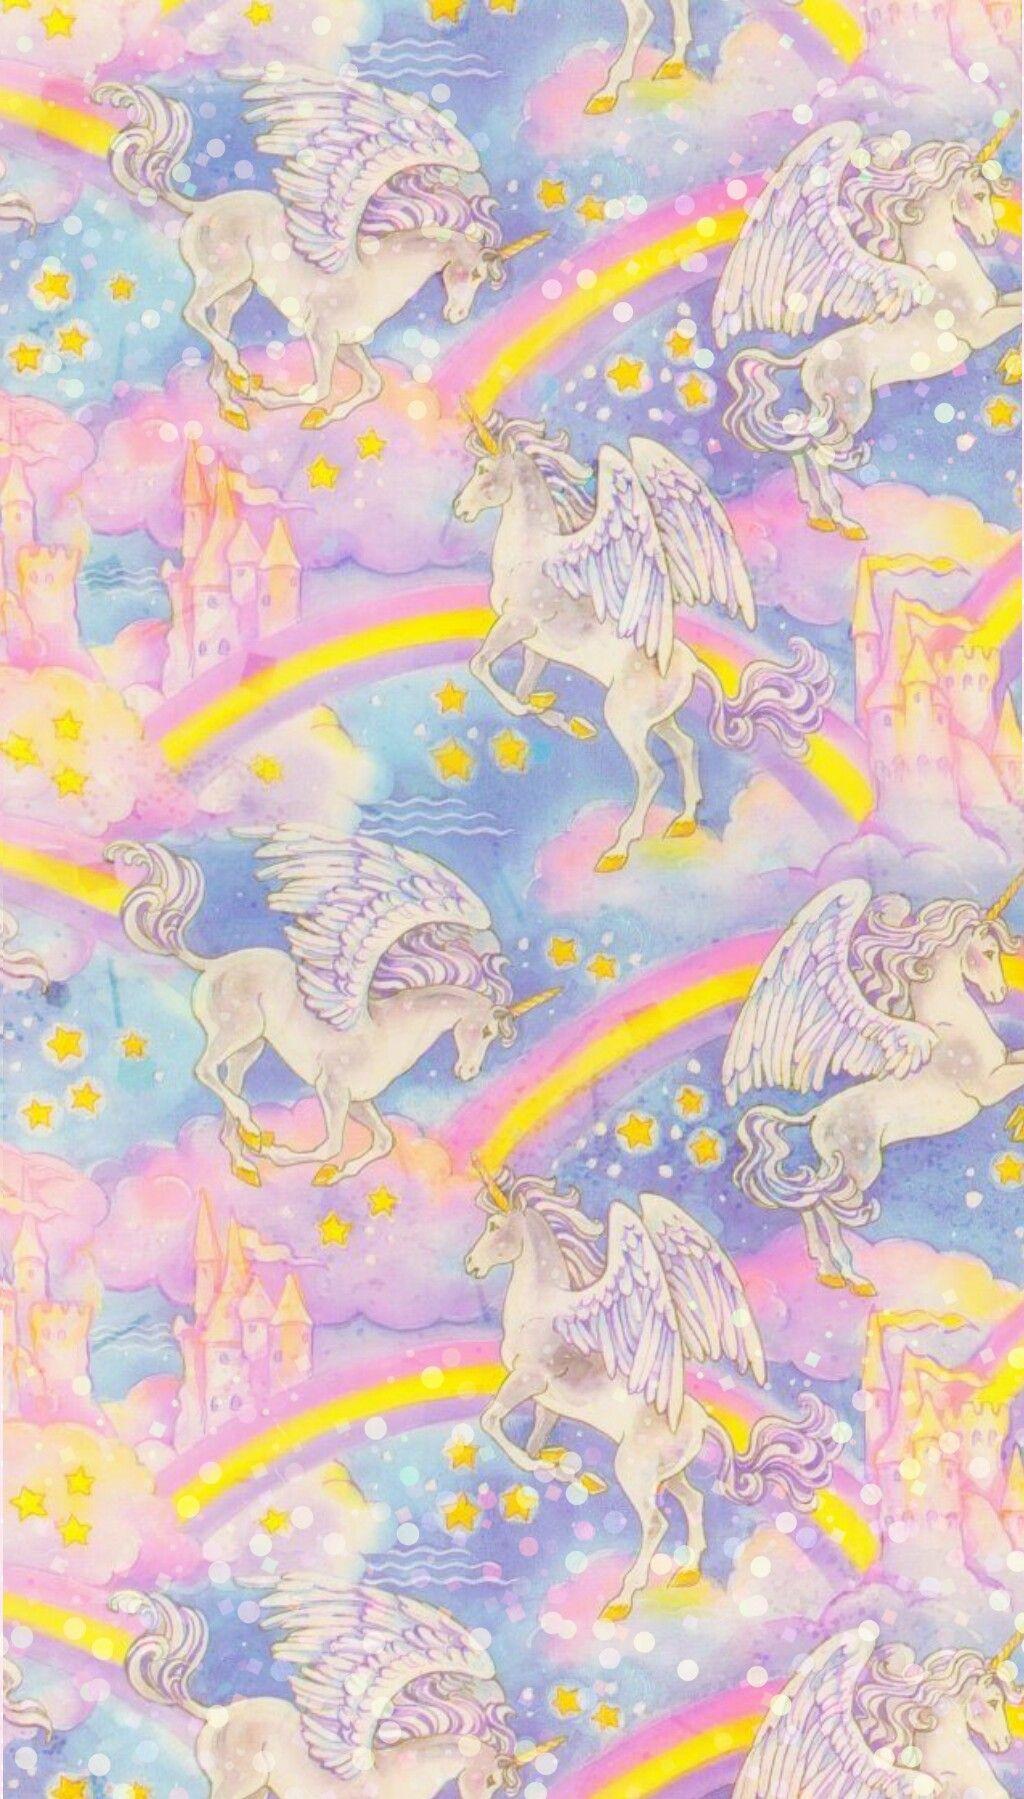 40 Glitter Rainbow Unicorn Wallpapers Download at